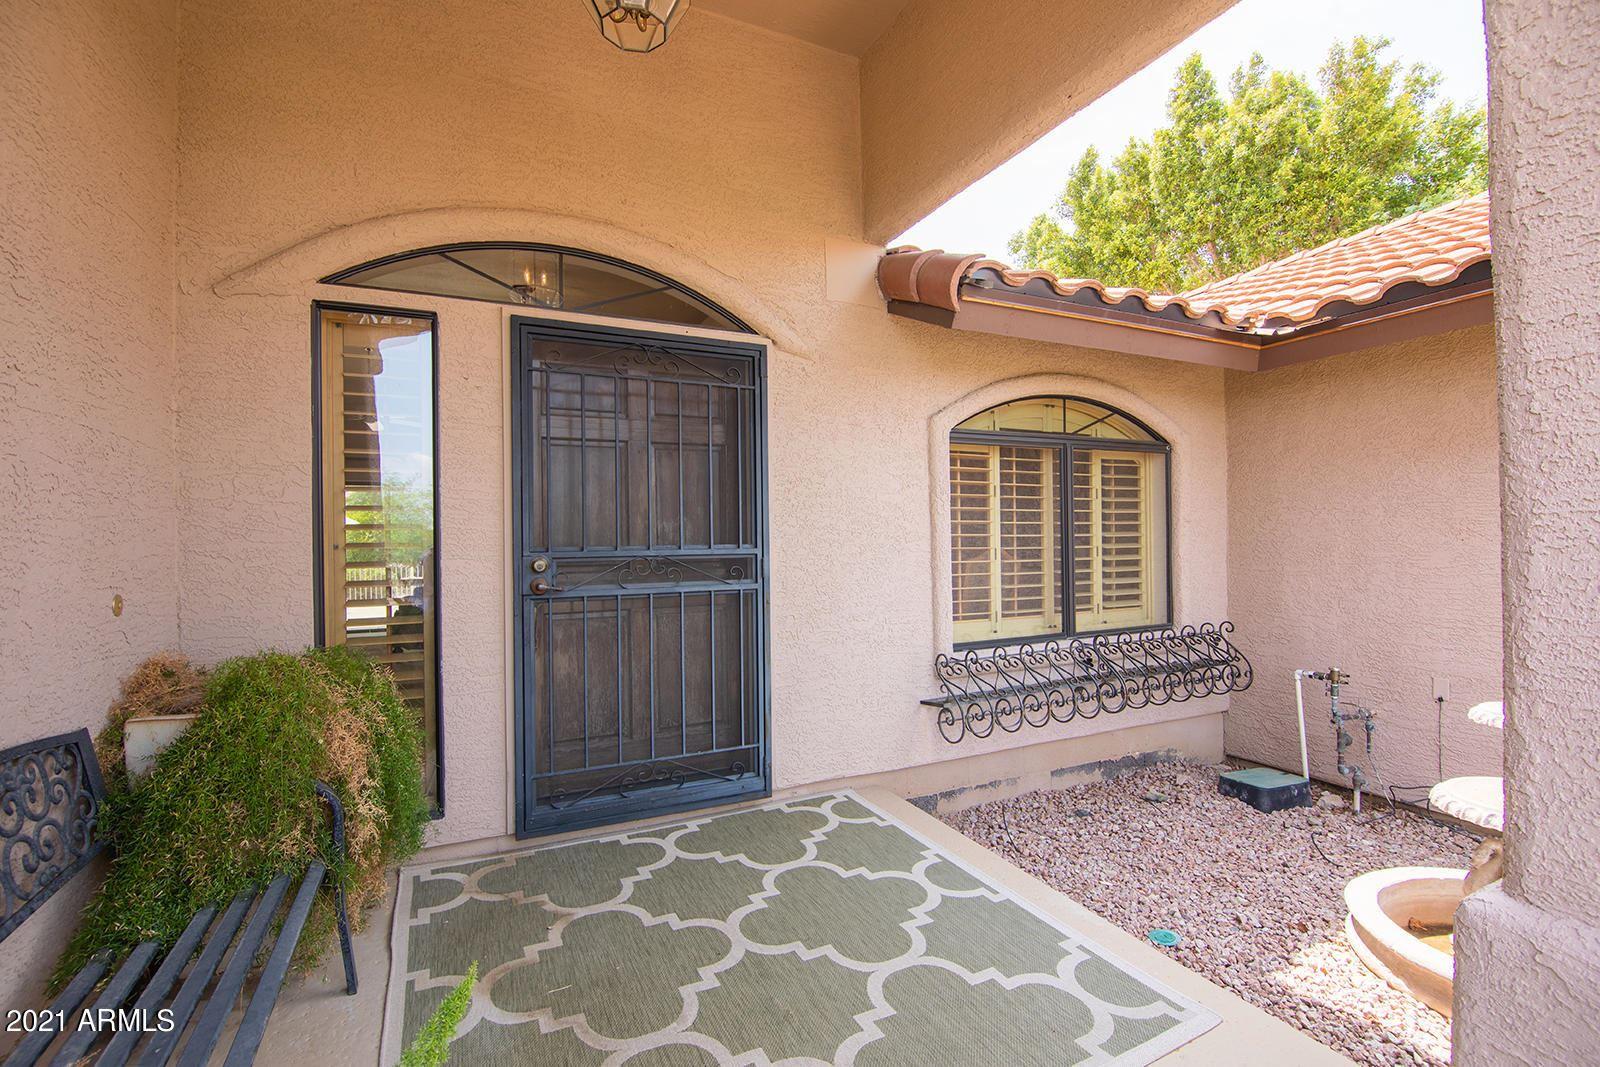 Photo of 15713 E THISTLE Drive, Fountain Hills, AZ 85268 (MLS # 6271138)